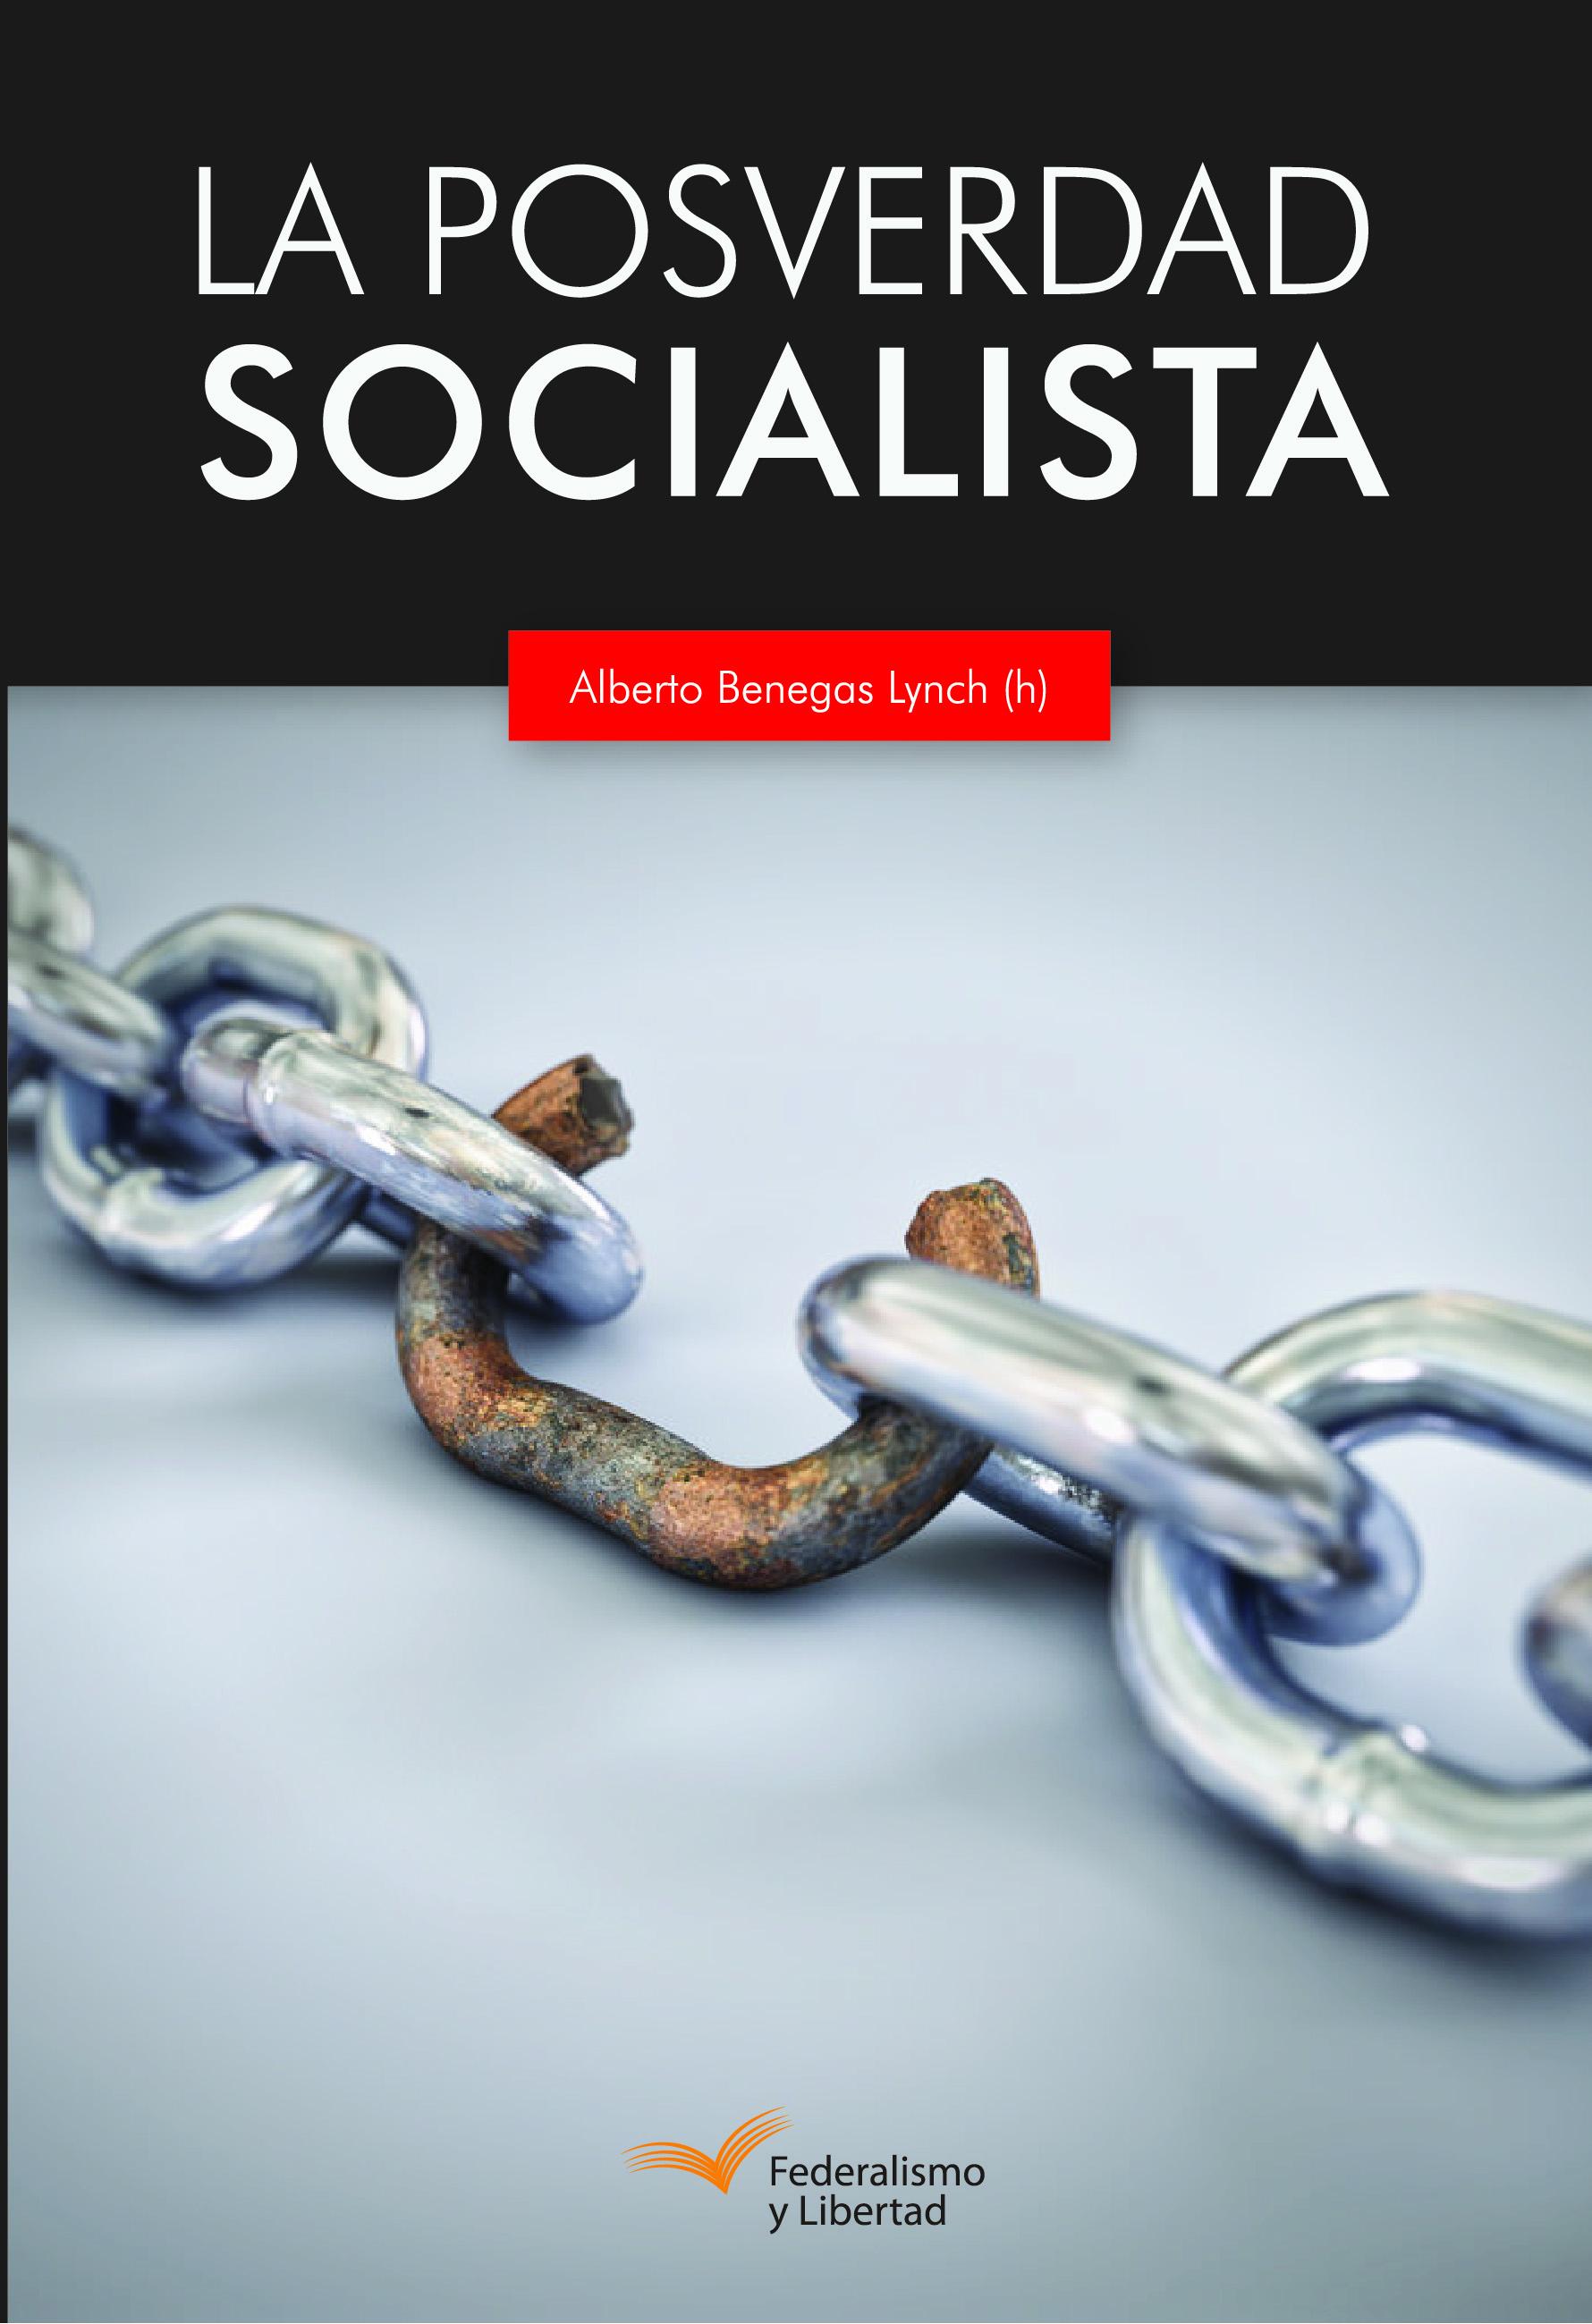 La posverdad socialista